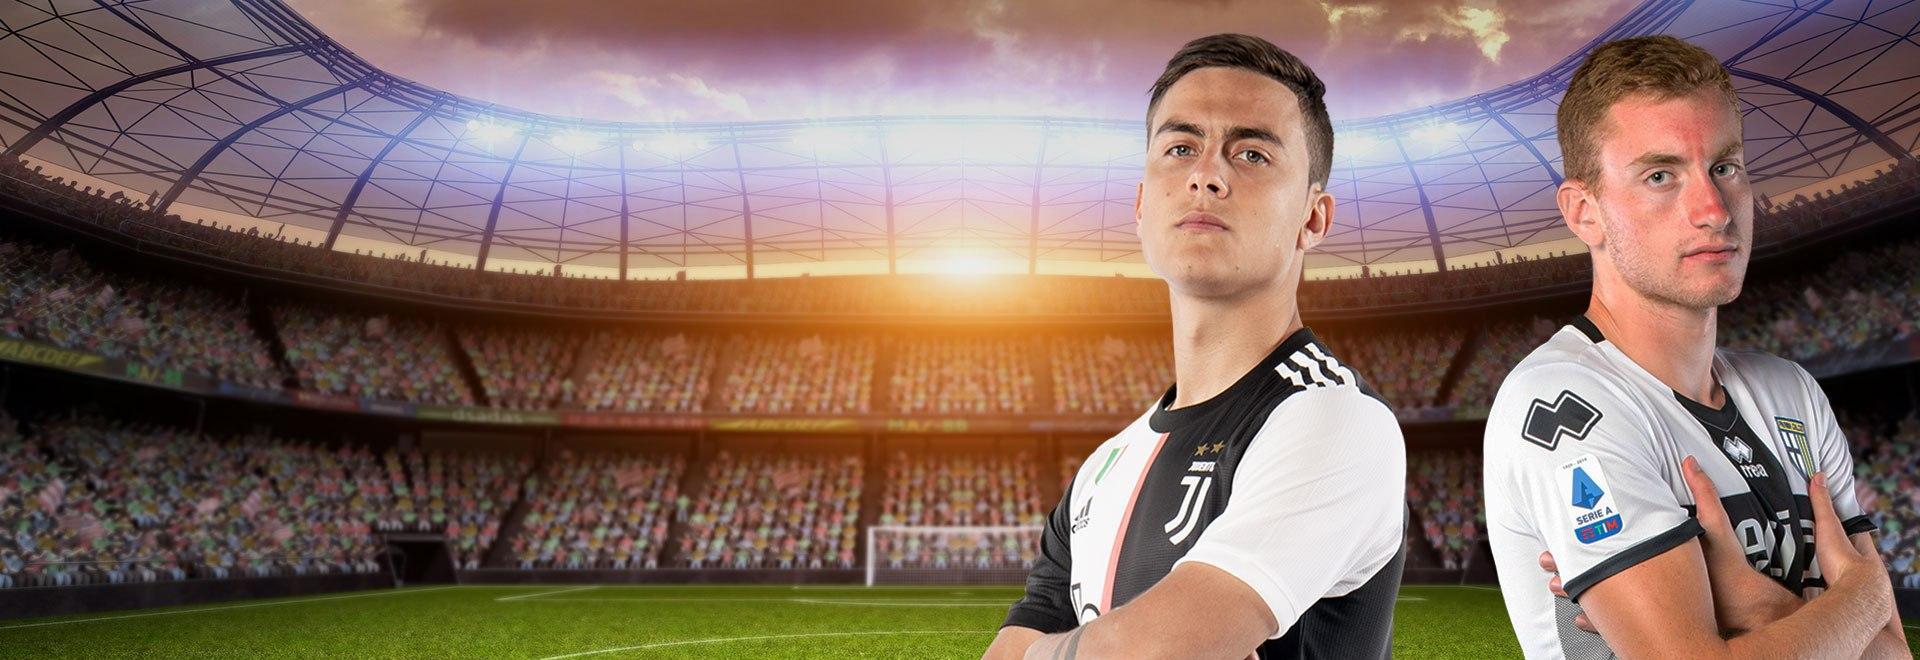 Juventus - Parma. 20a g.